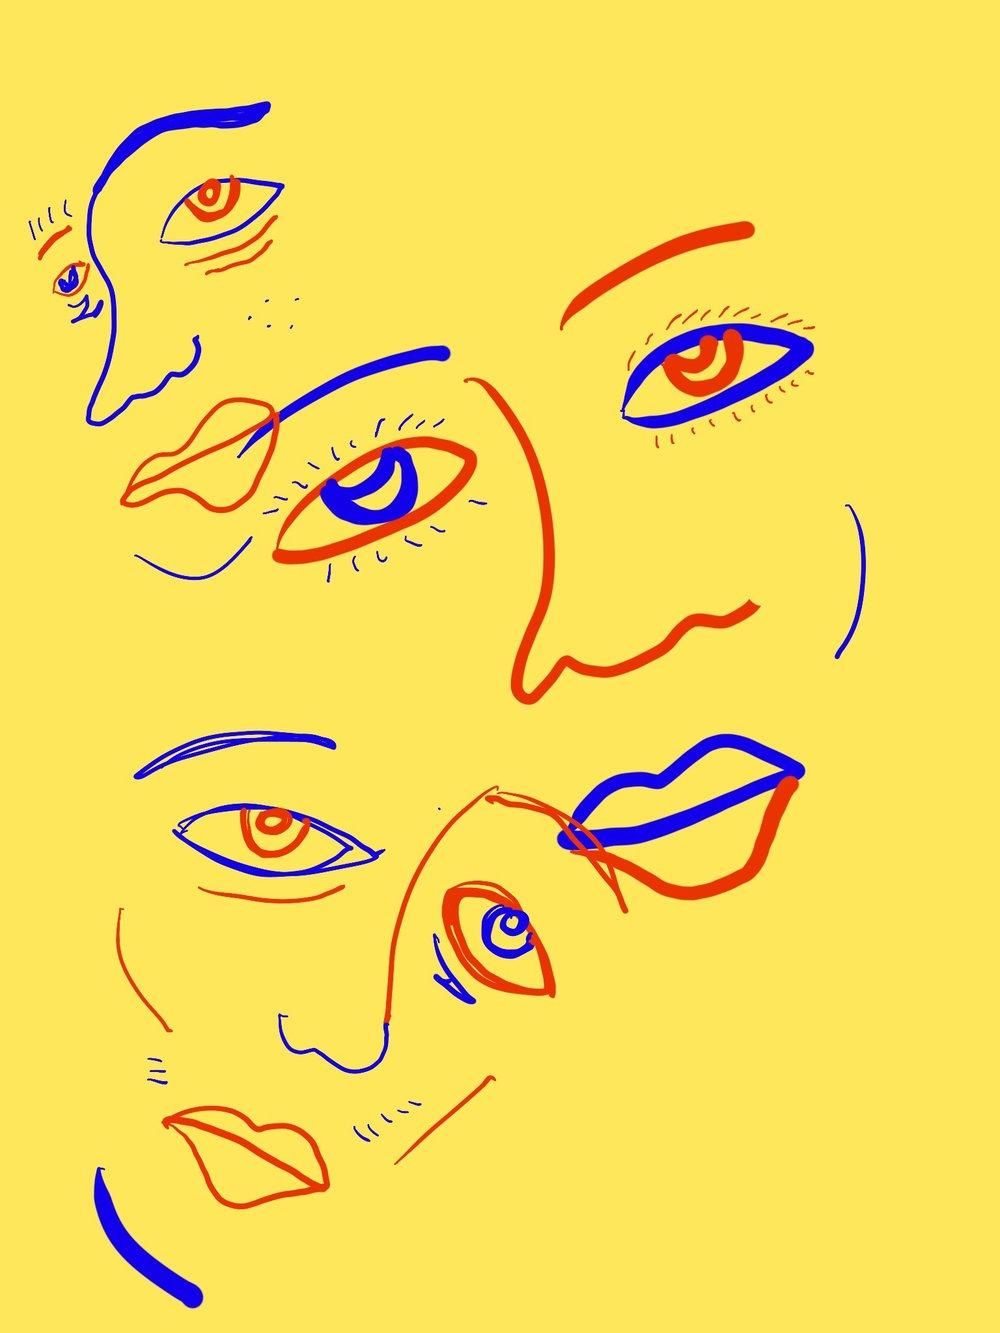 Untitled_Artwork 4.jpg